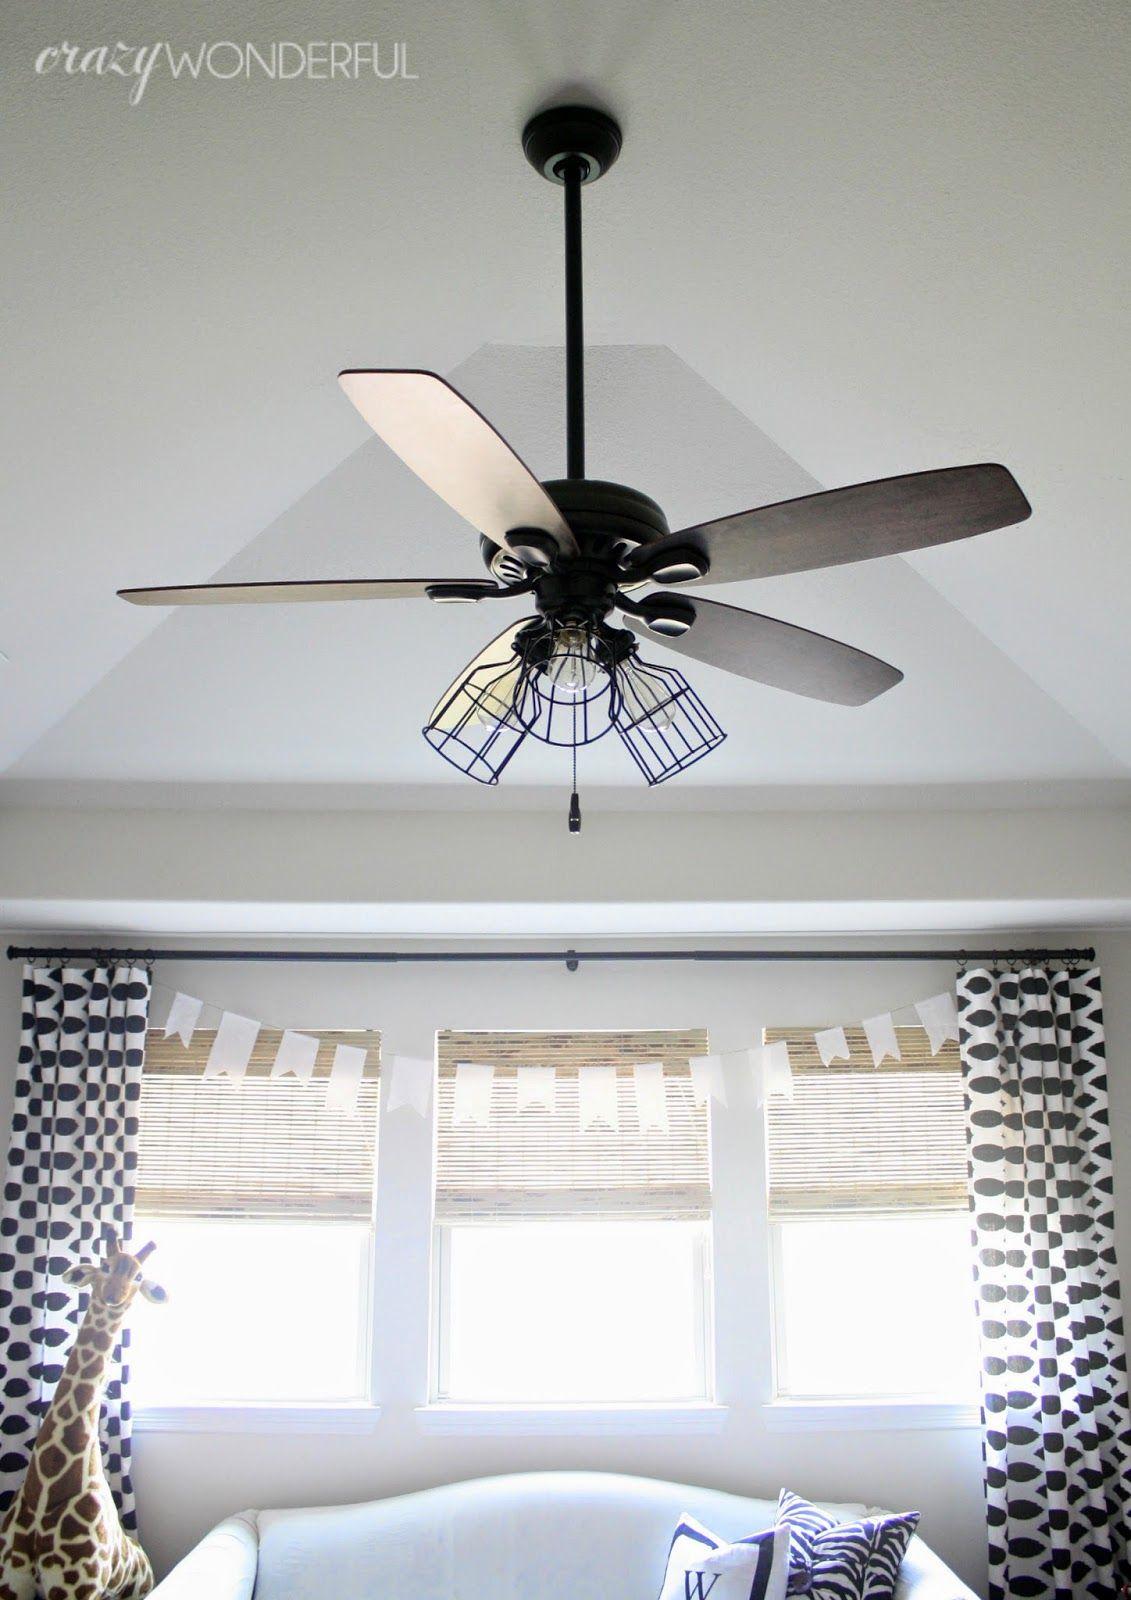 Crazy Wonderful DIY cage light ceiling fan Someday